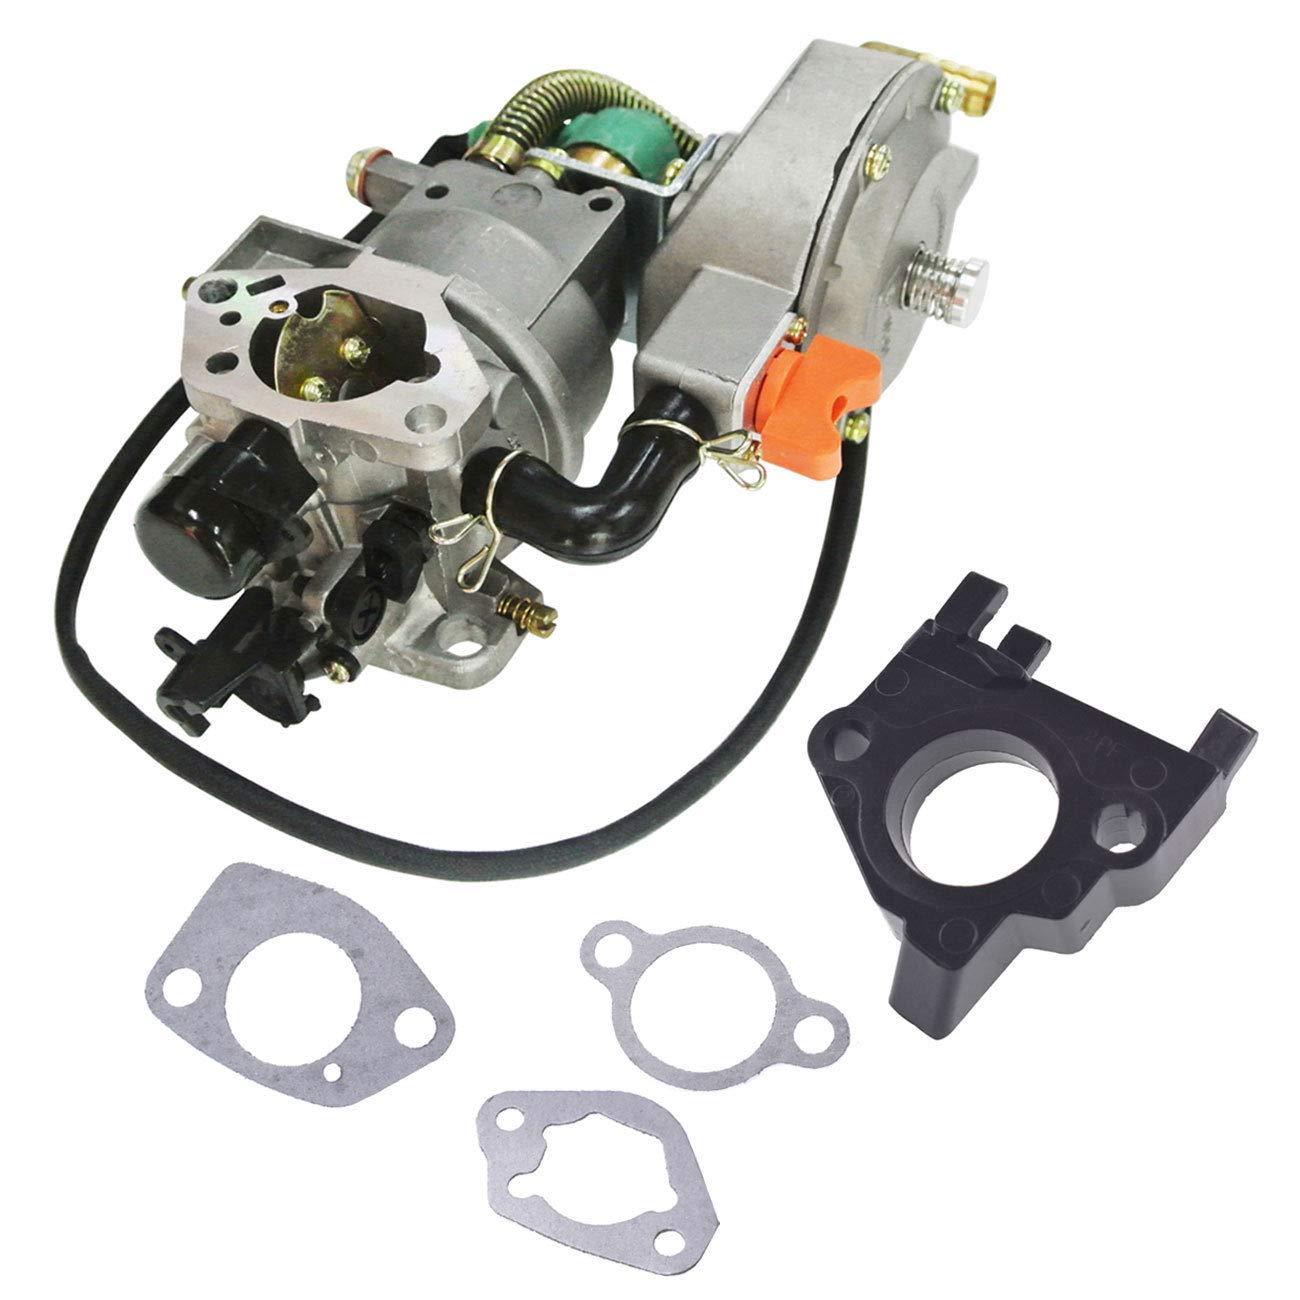 FidgetKute Dual Fuel Generator Carburetor for GX390 188F Spacer Insulator Gasket by FidgetKute